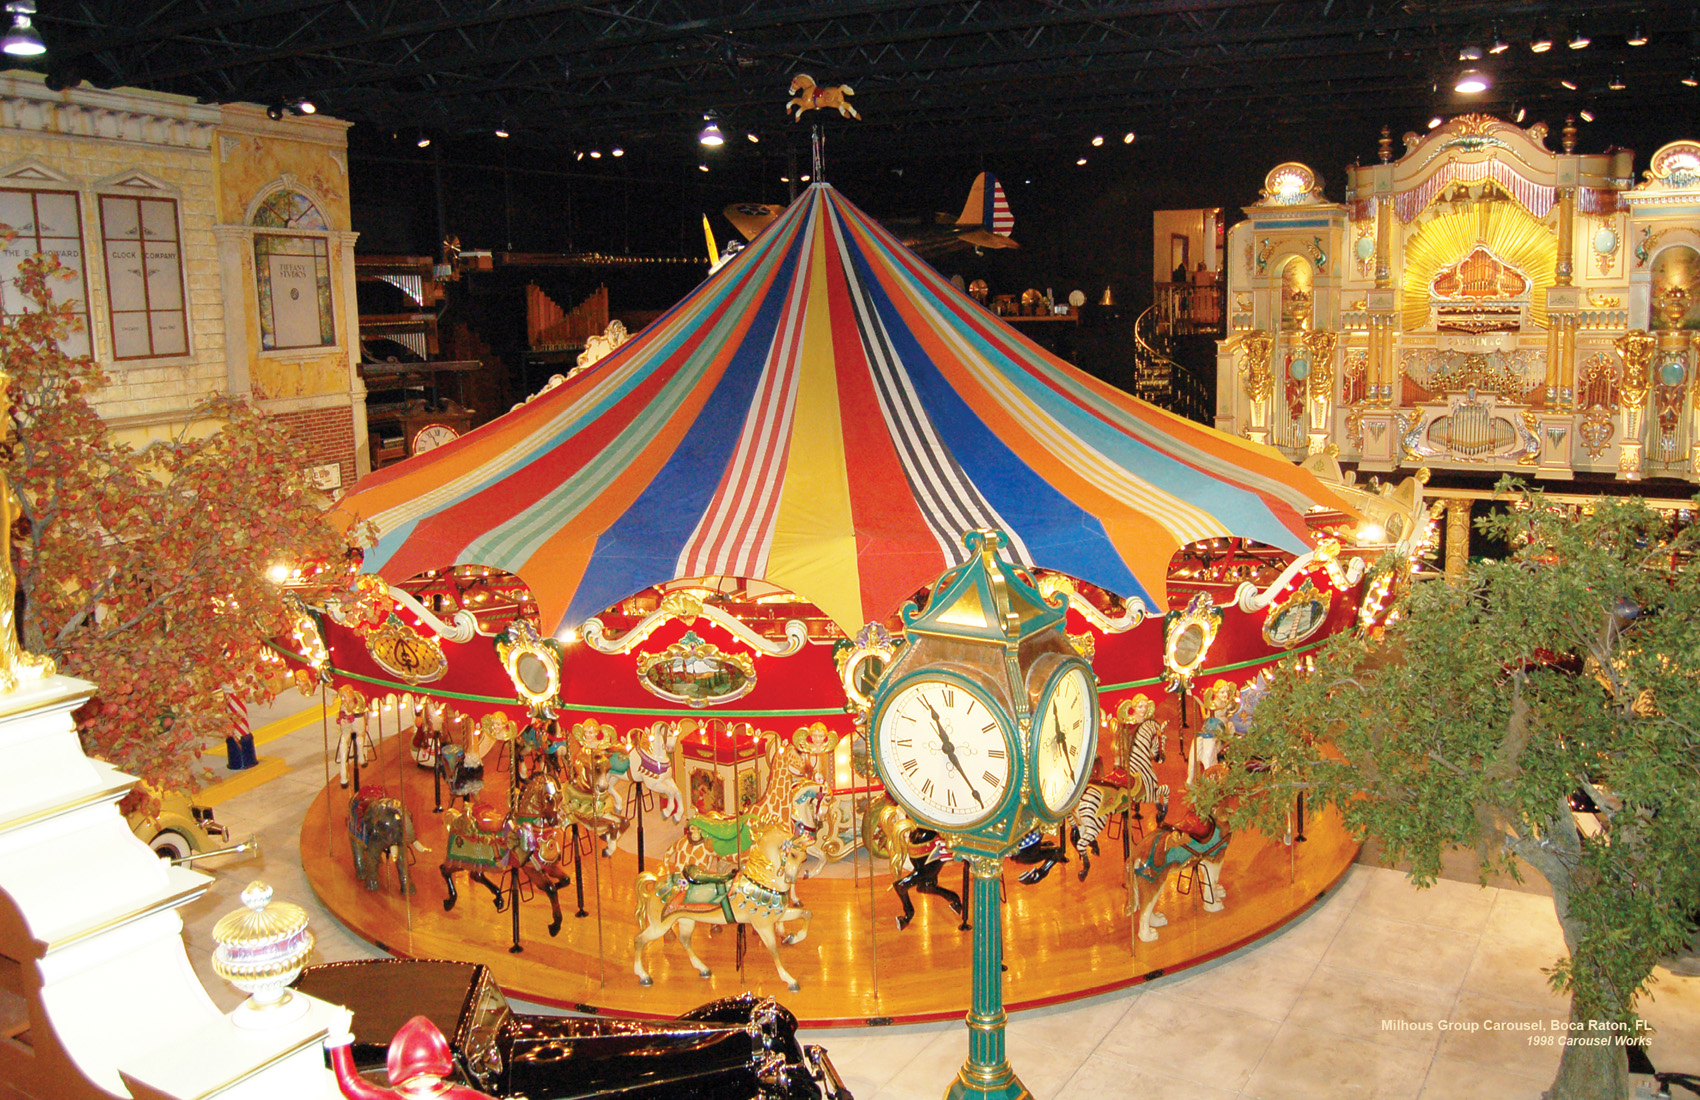 1999-CW-Milhous-Group-carousel-Florida-CNT-center-MAR-08